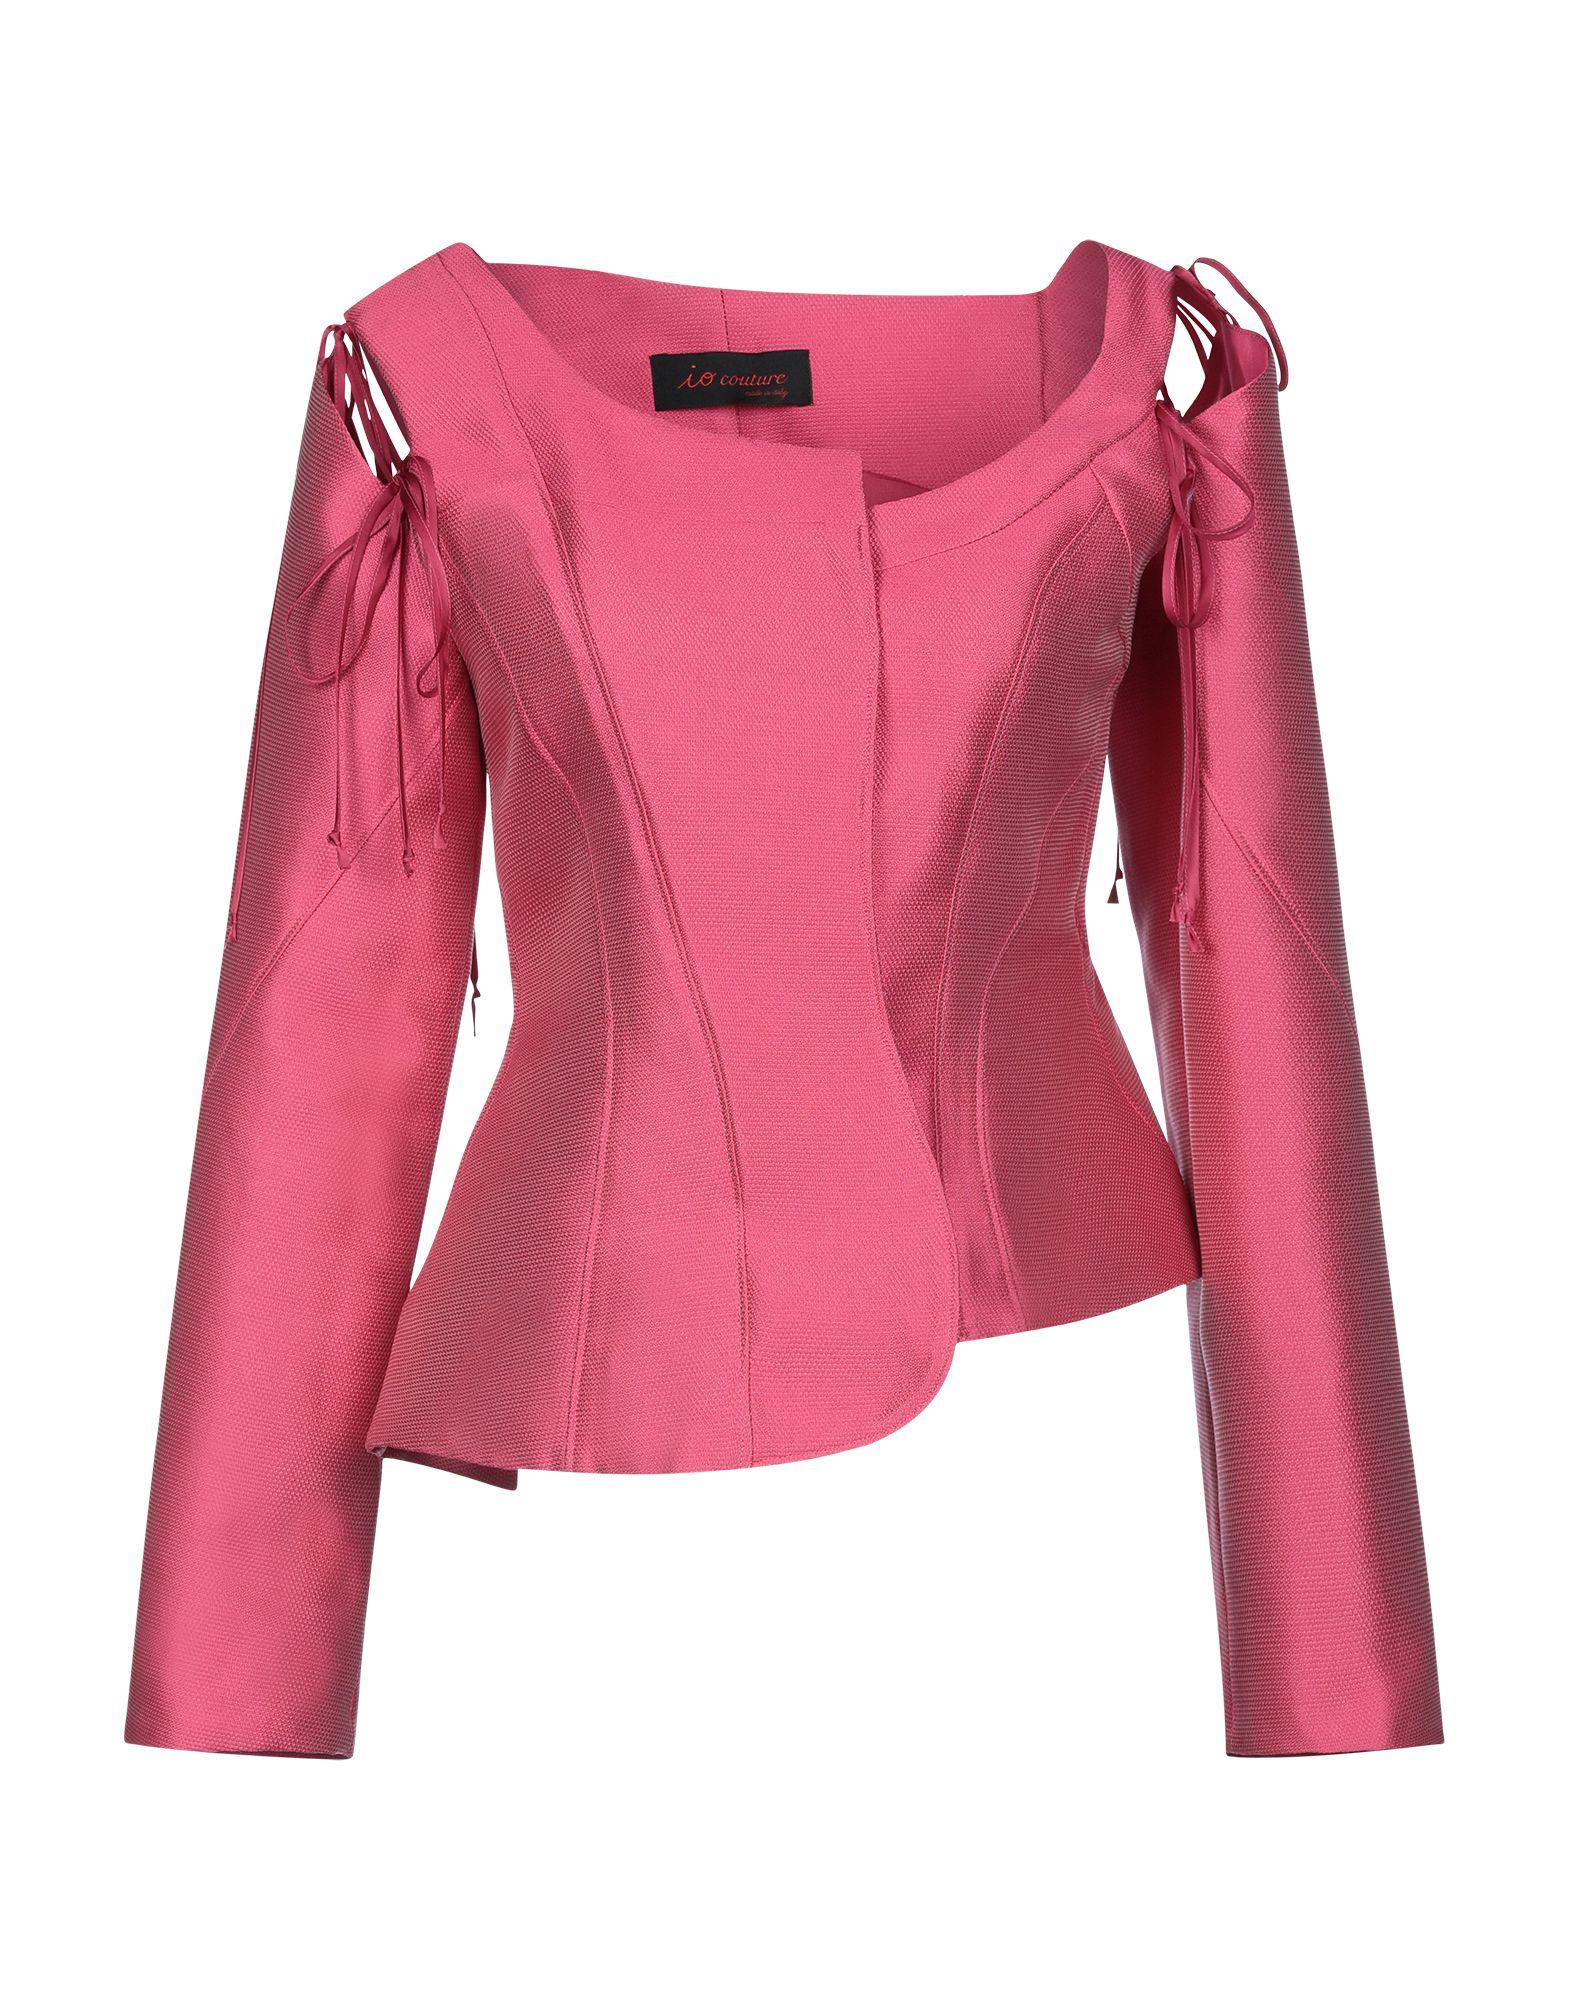 IO COUTURE Пиджак io couture блузка